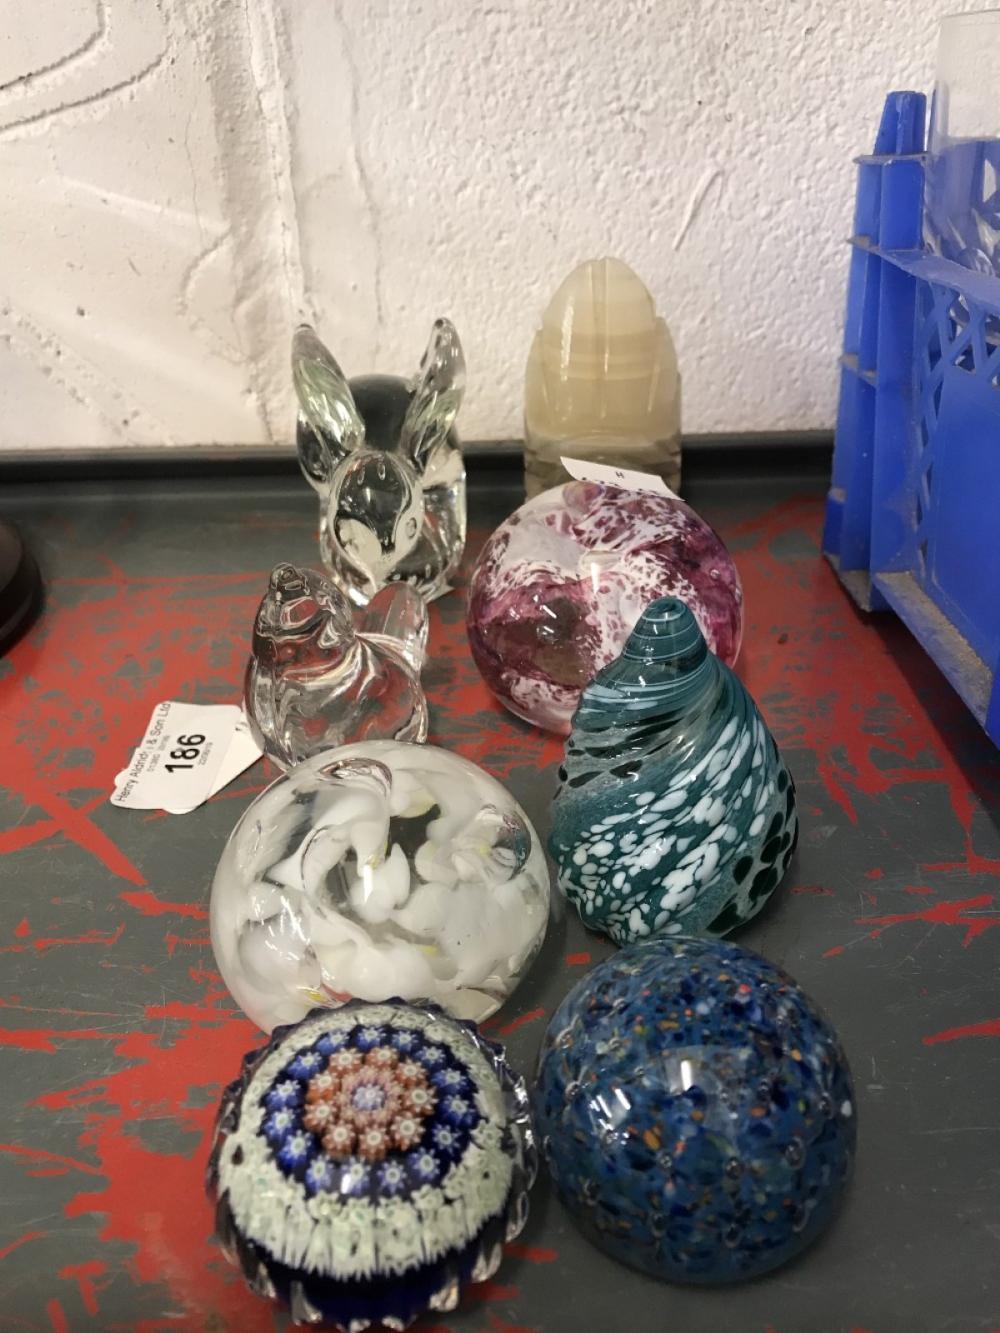 20th cent. Glassware: Paperweights, 8 rabbits, wren, spiral, etc.